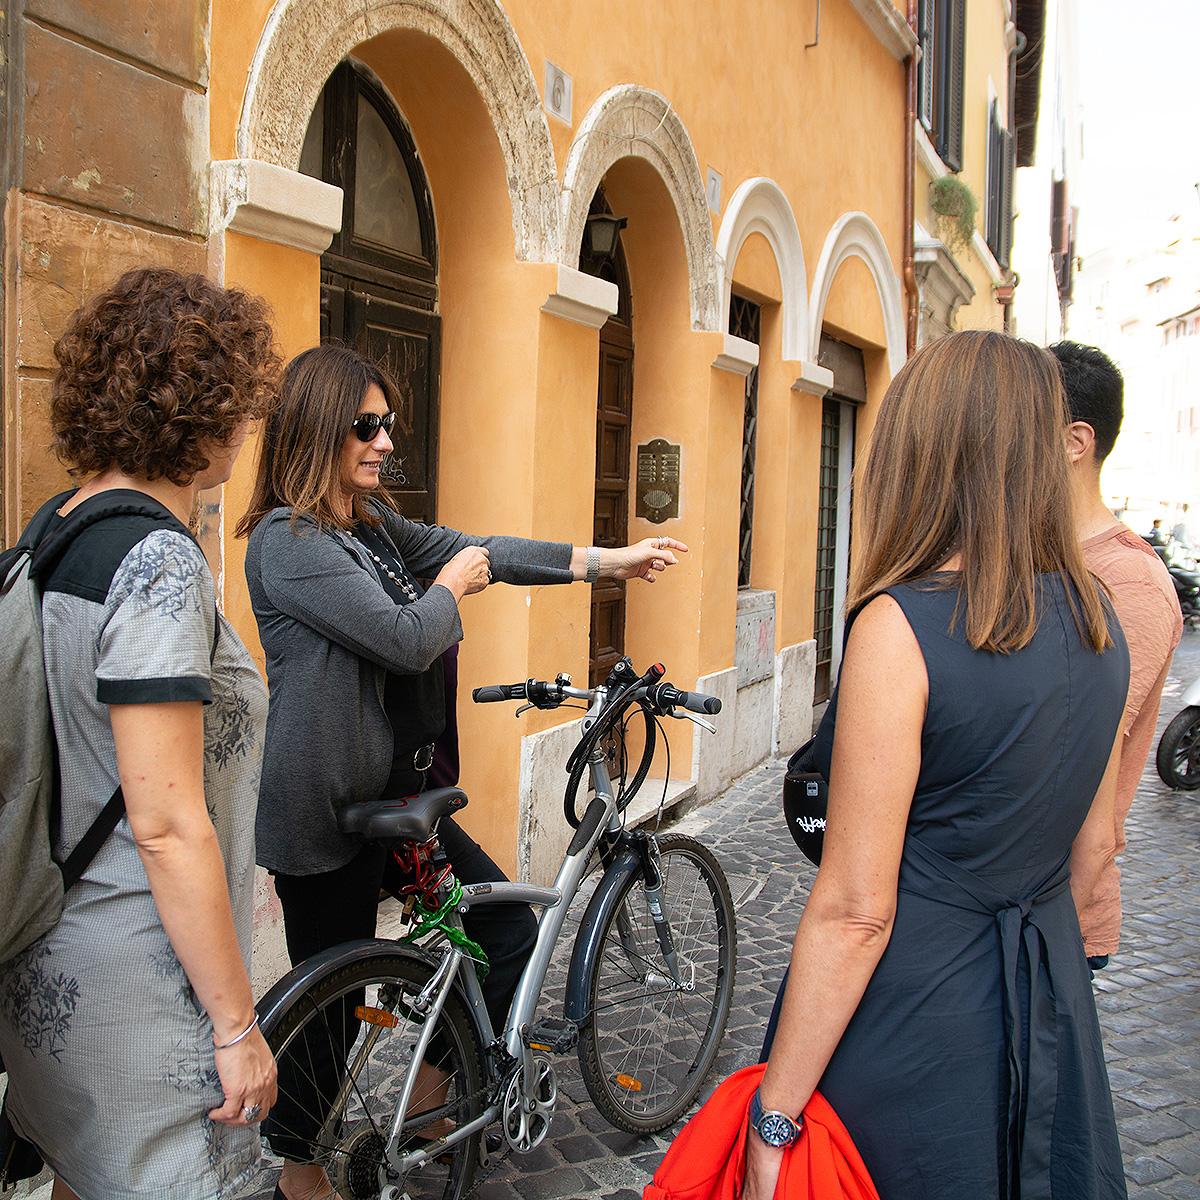 Week end à Rome : visite guidée à campo de'fiori